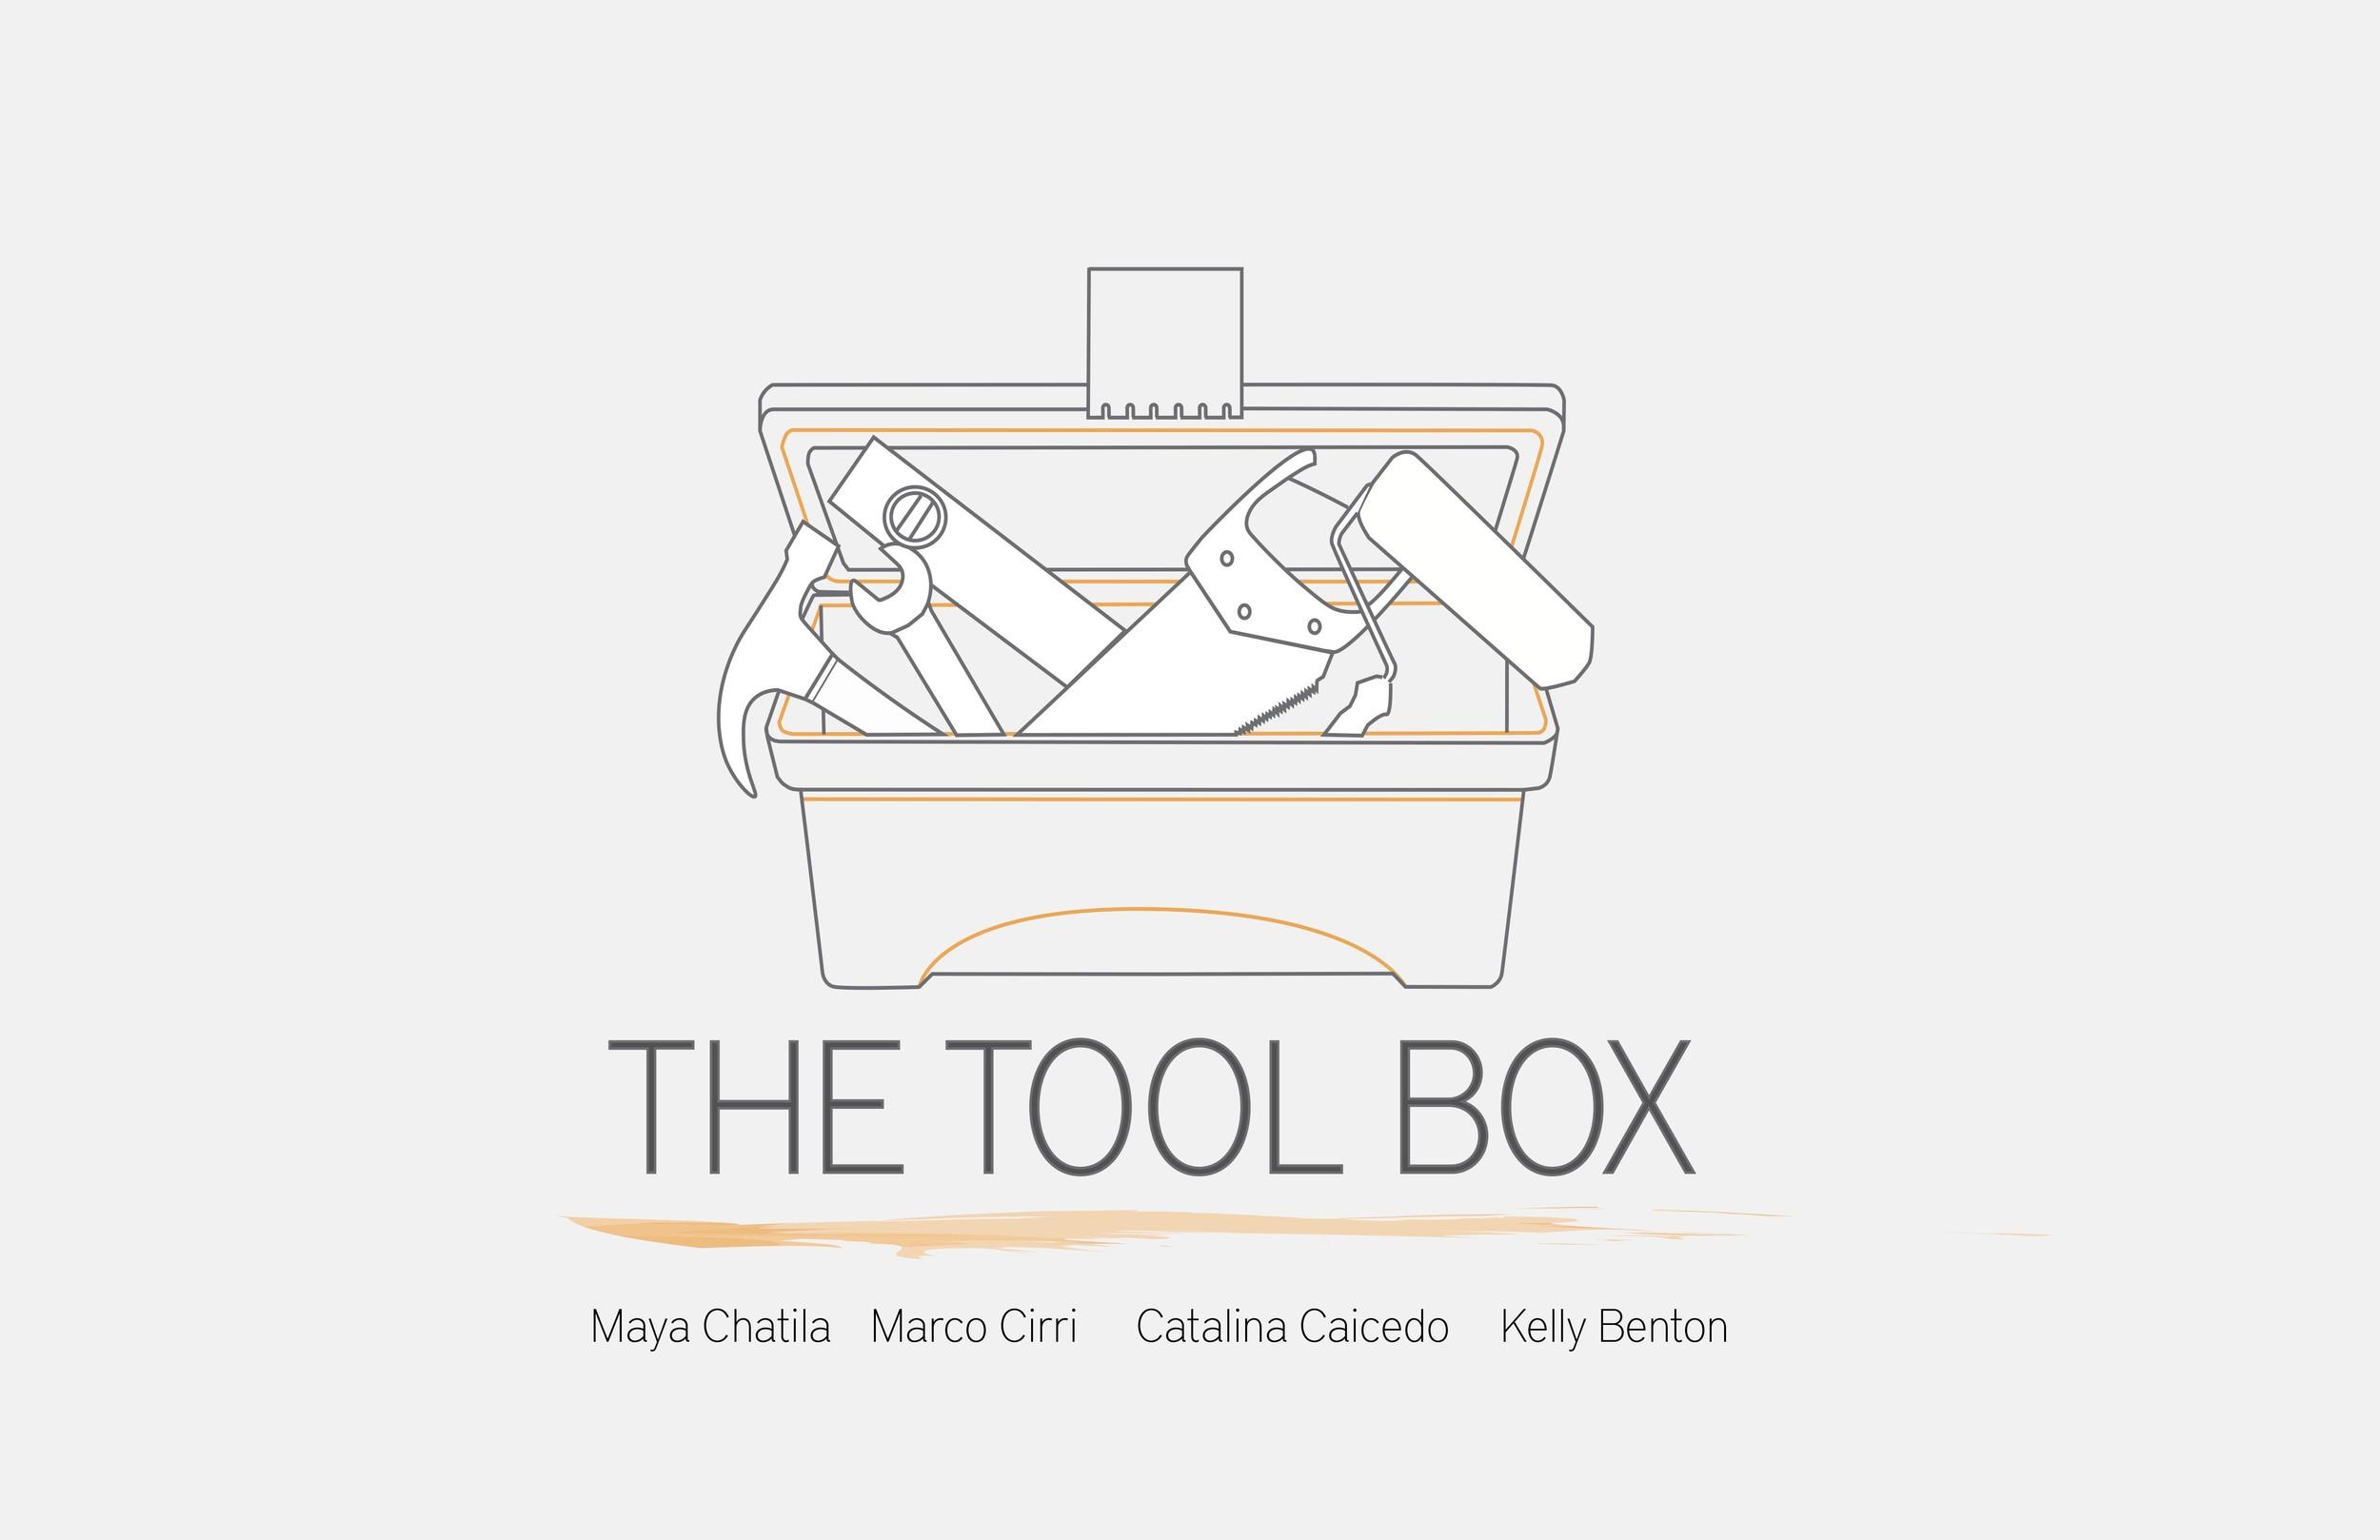 5_the_toolbox 1.jpg